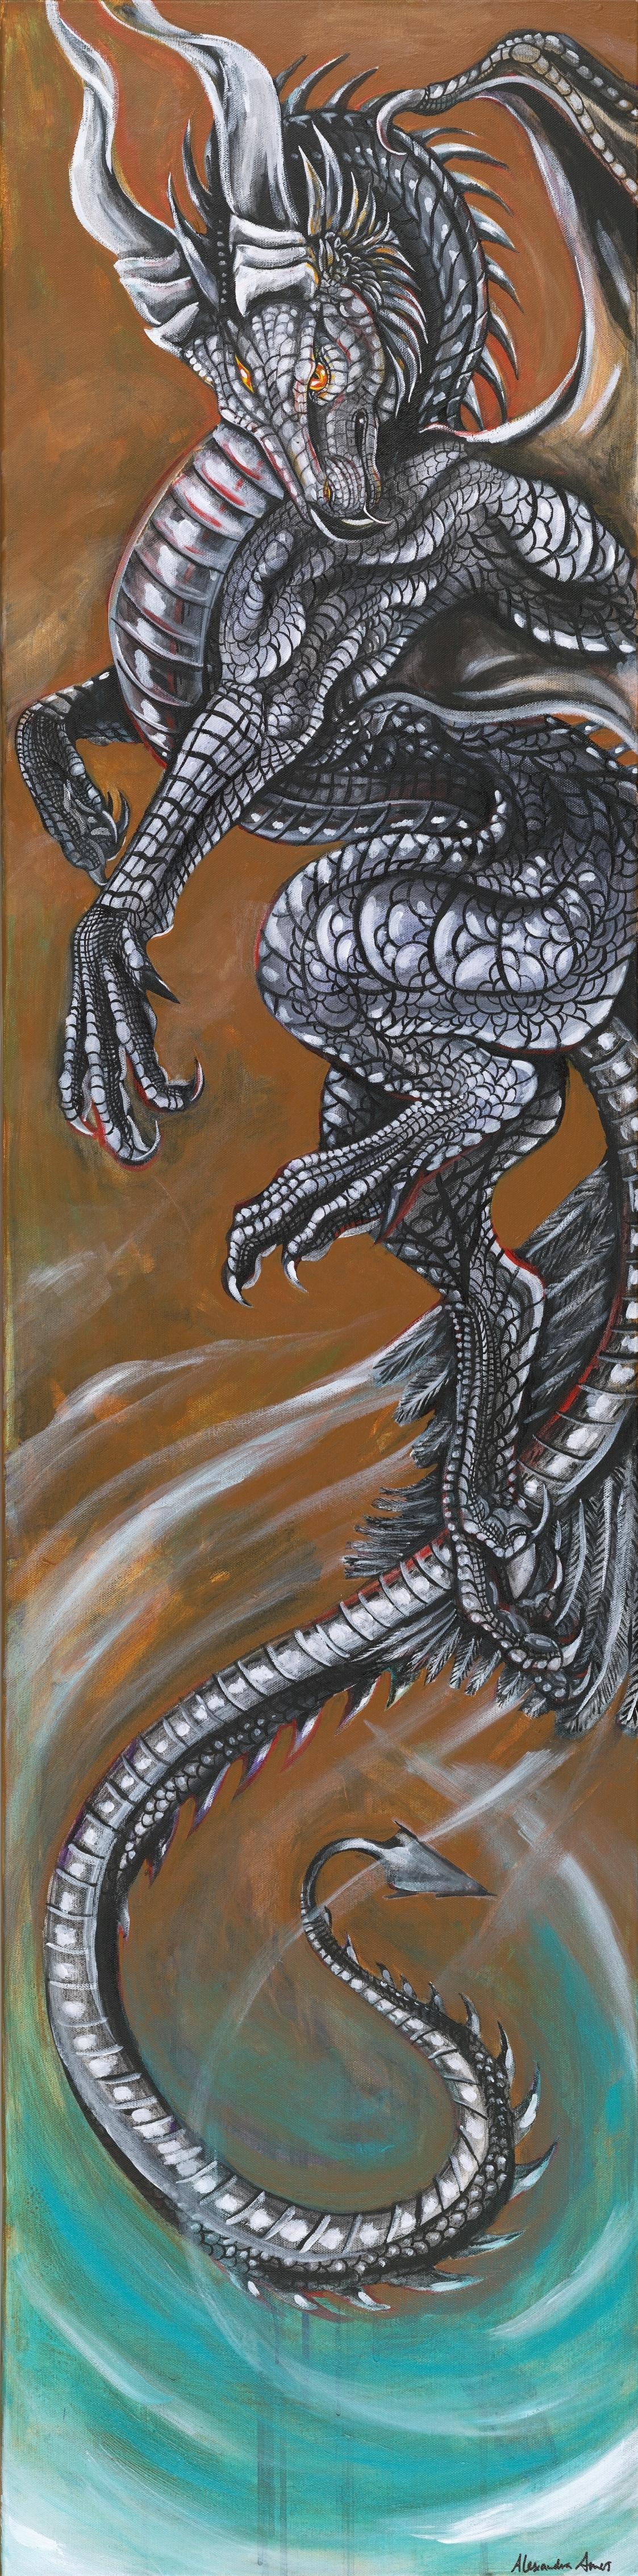 Dragon,acrylic on canvas